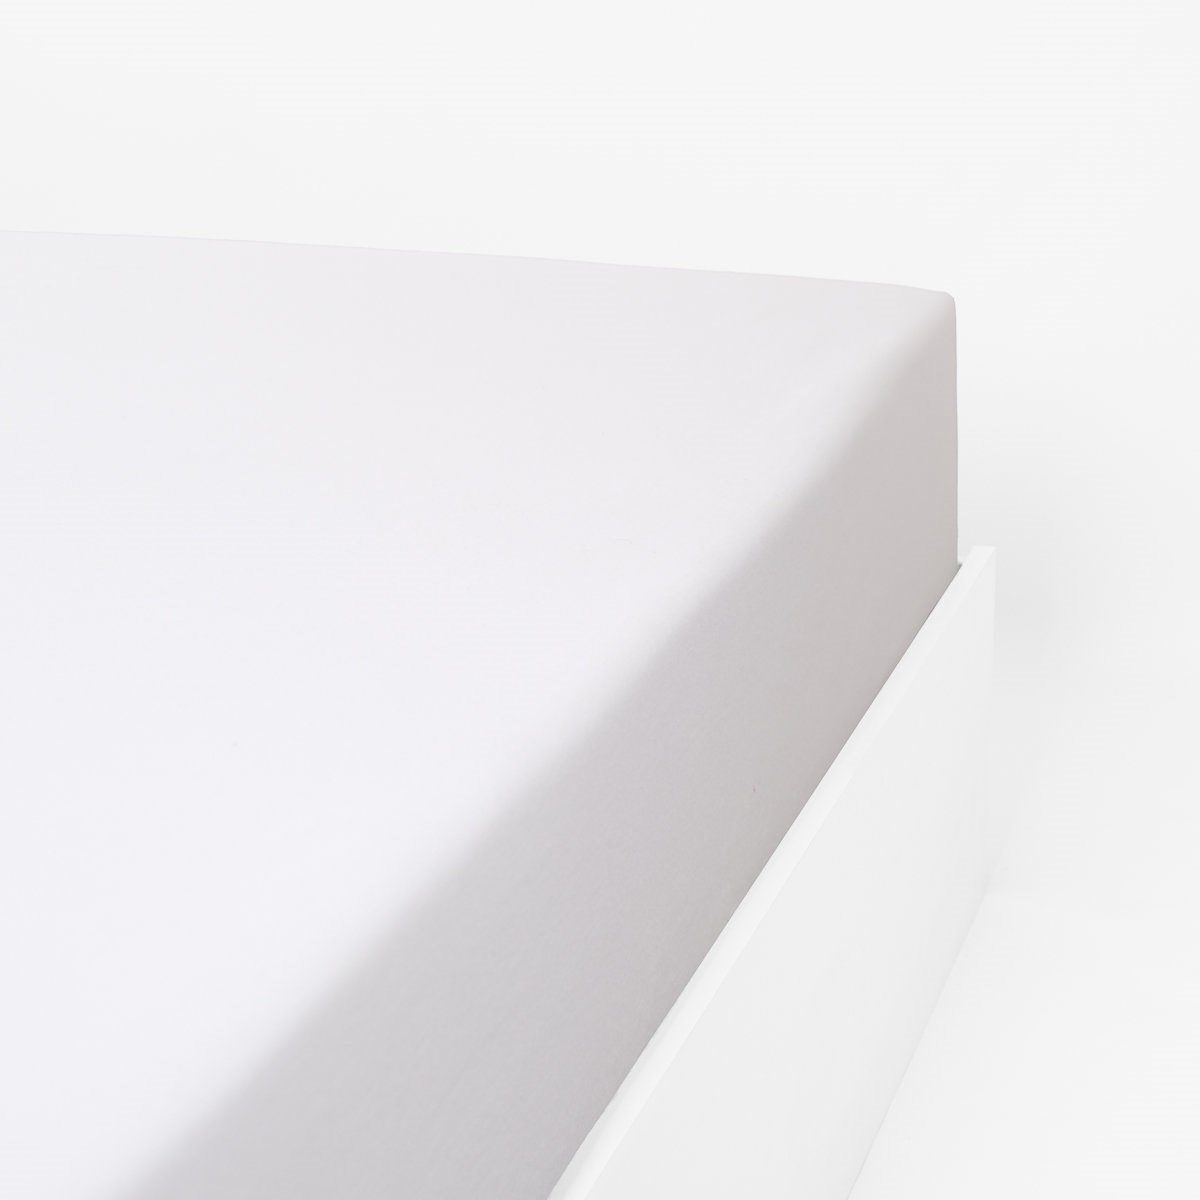 Drap housse flanelle en Molleton Blanc 180x200 cm